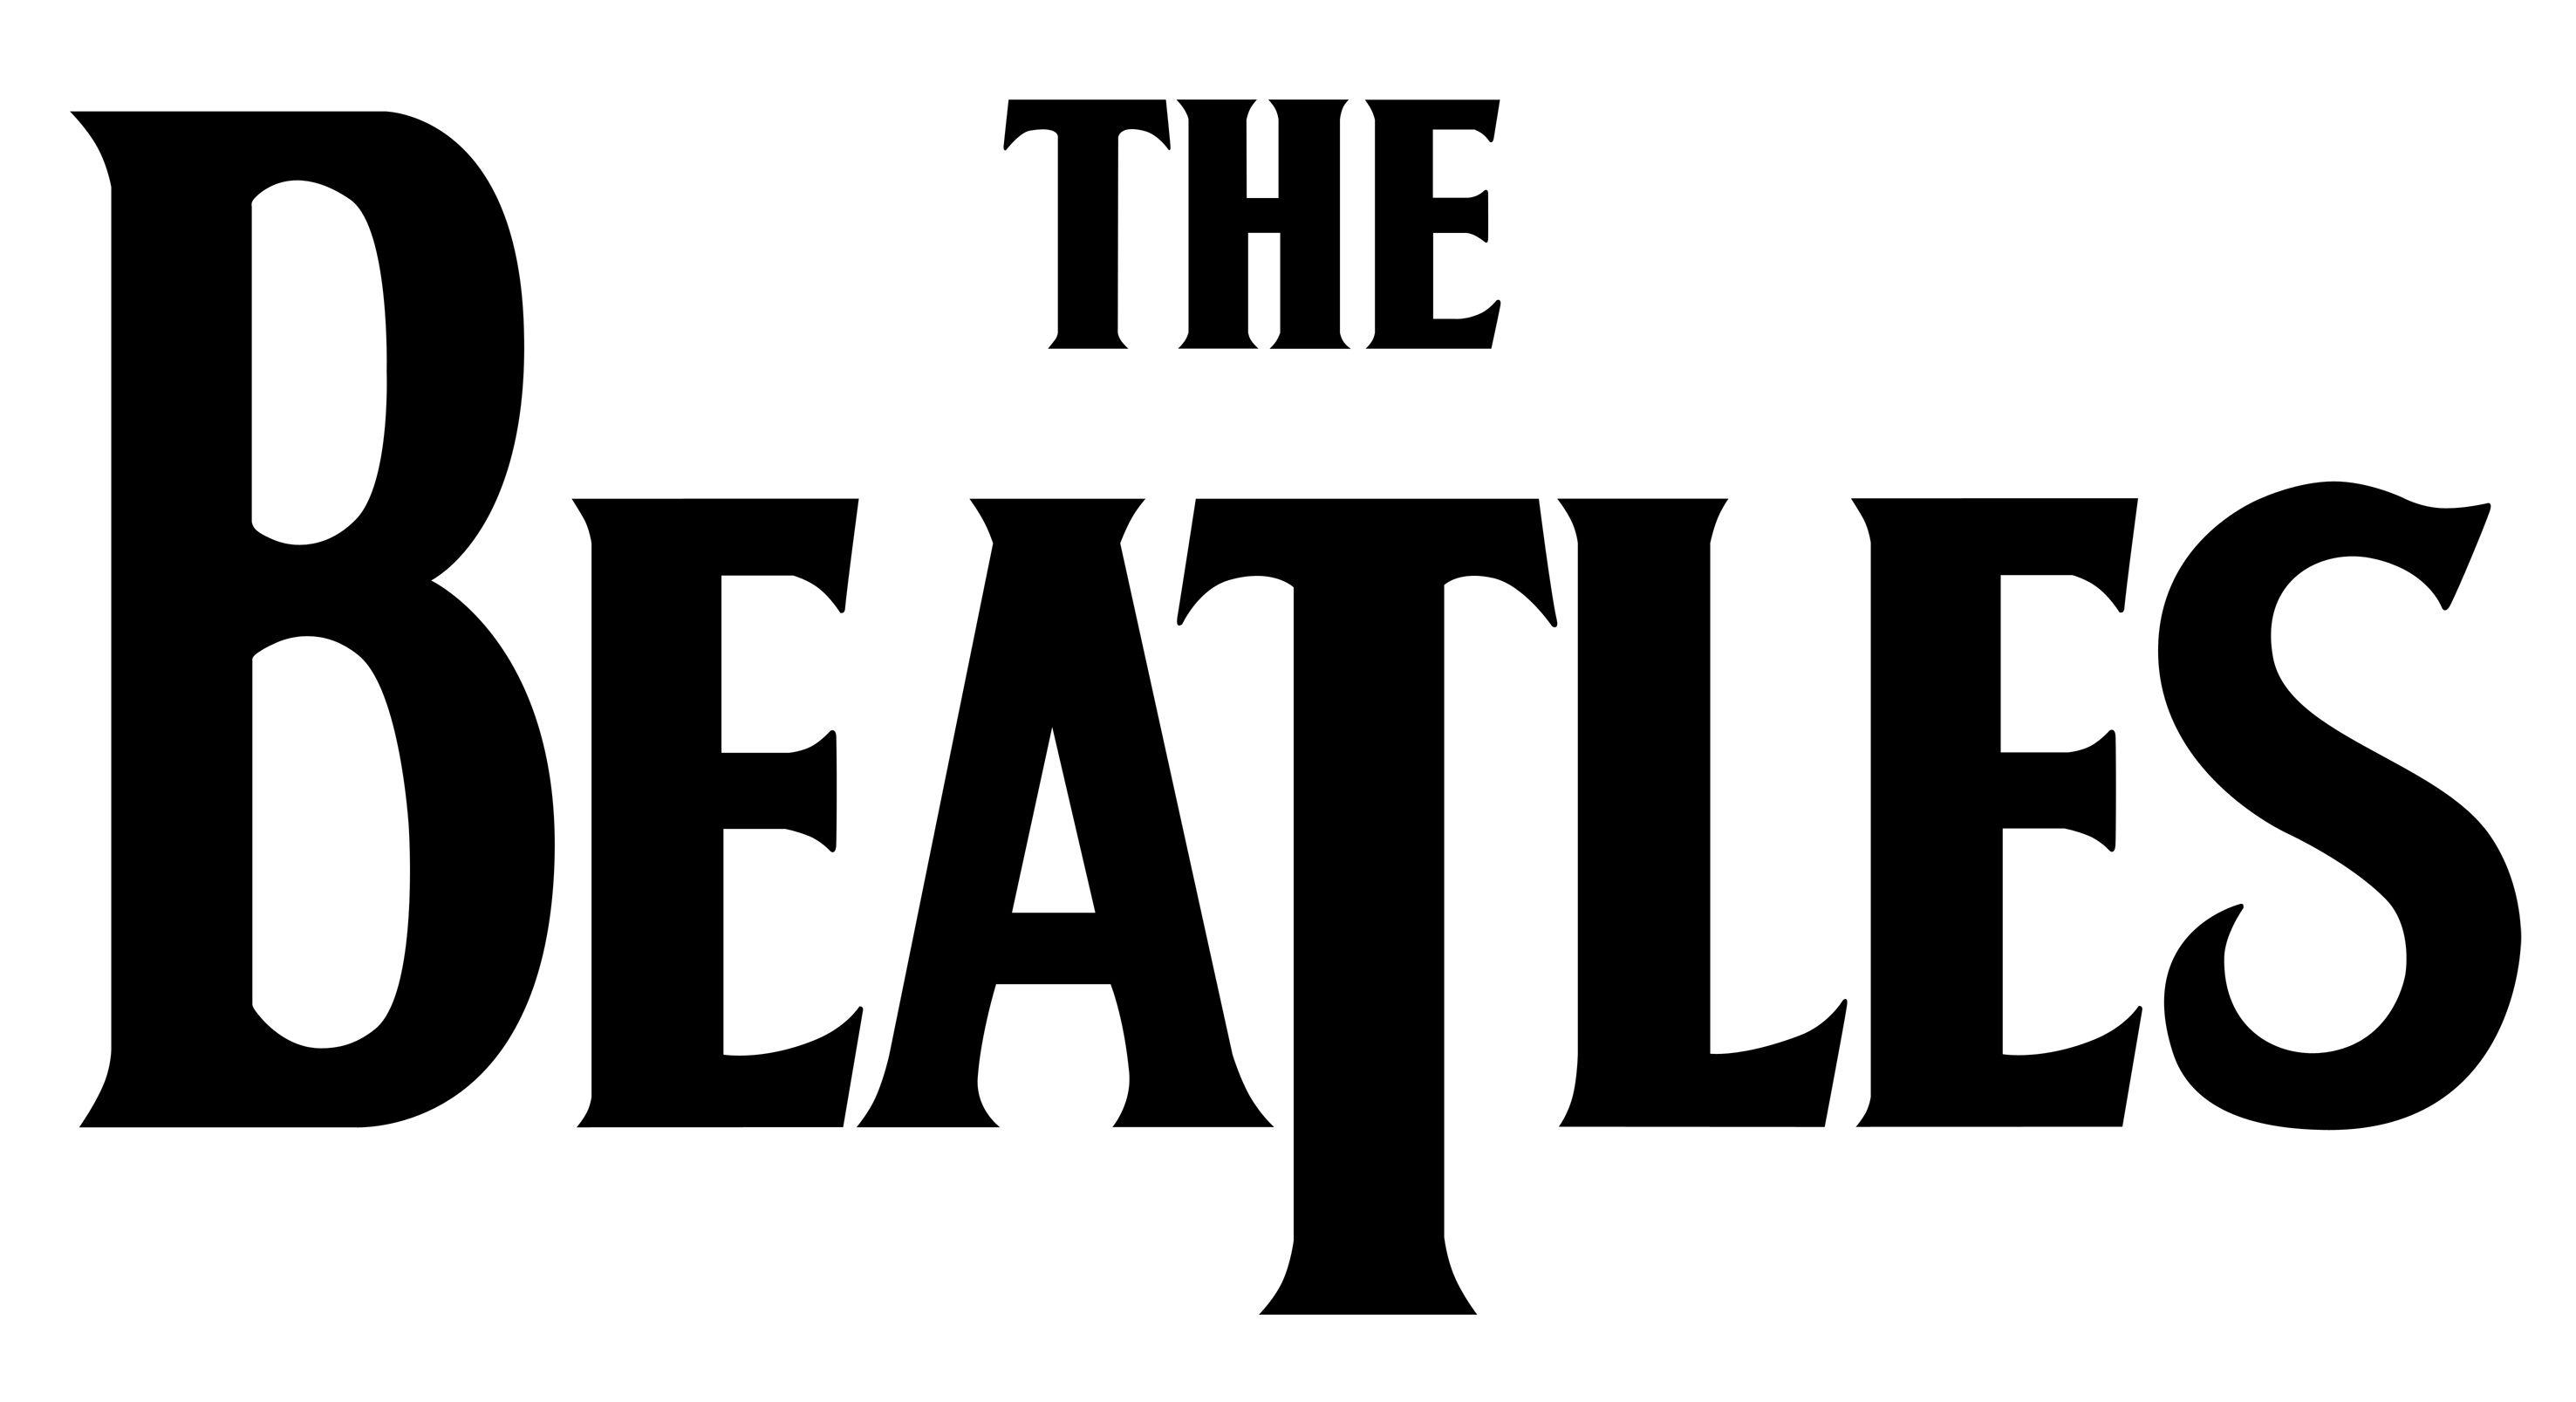 Beatles Cliparts The Beatles Band Logos Music Logo Design